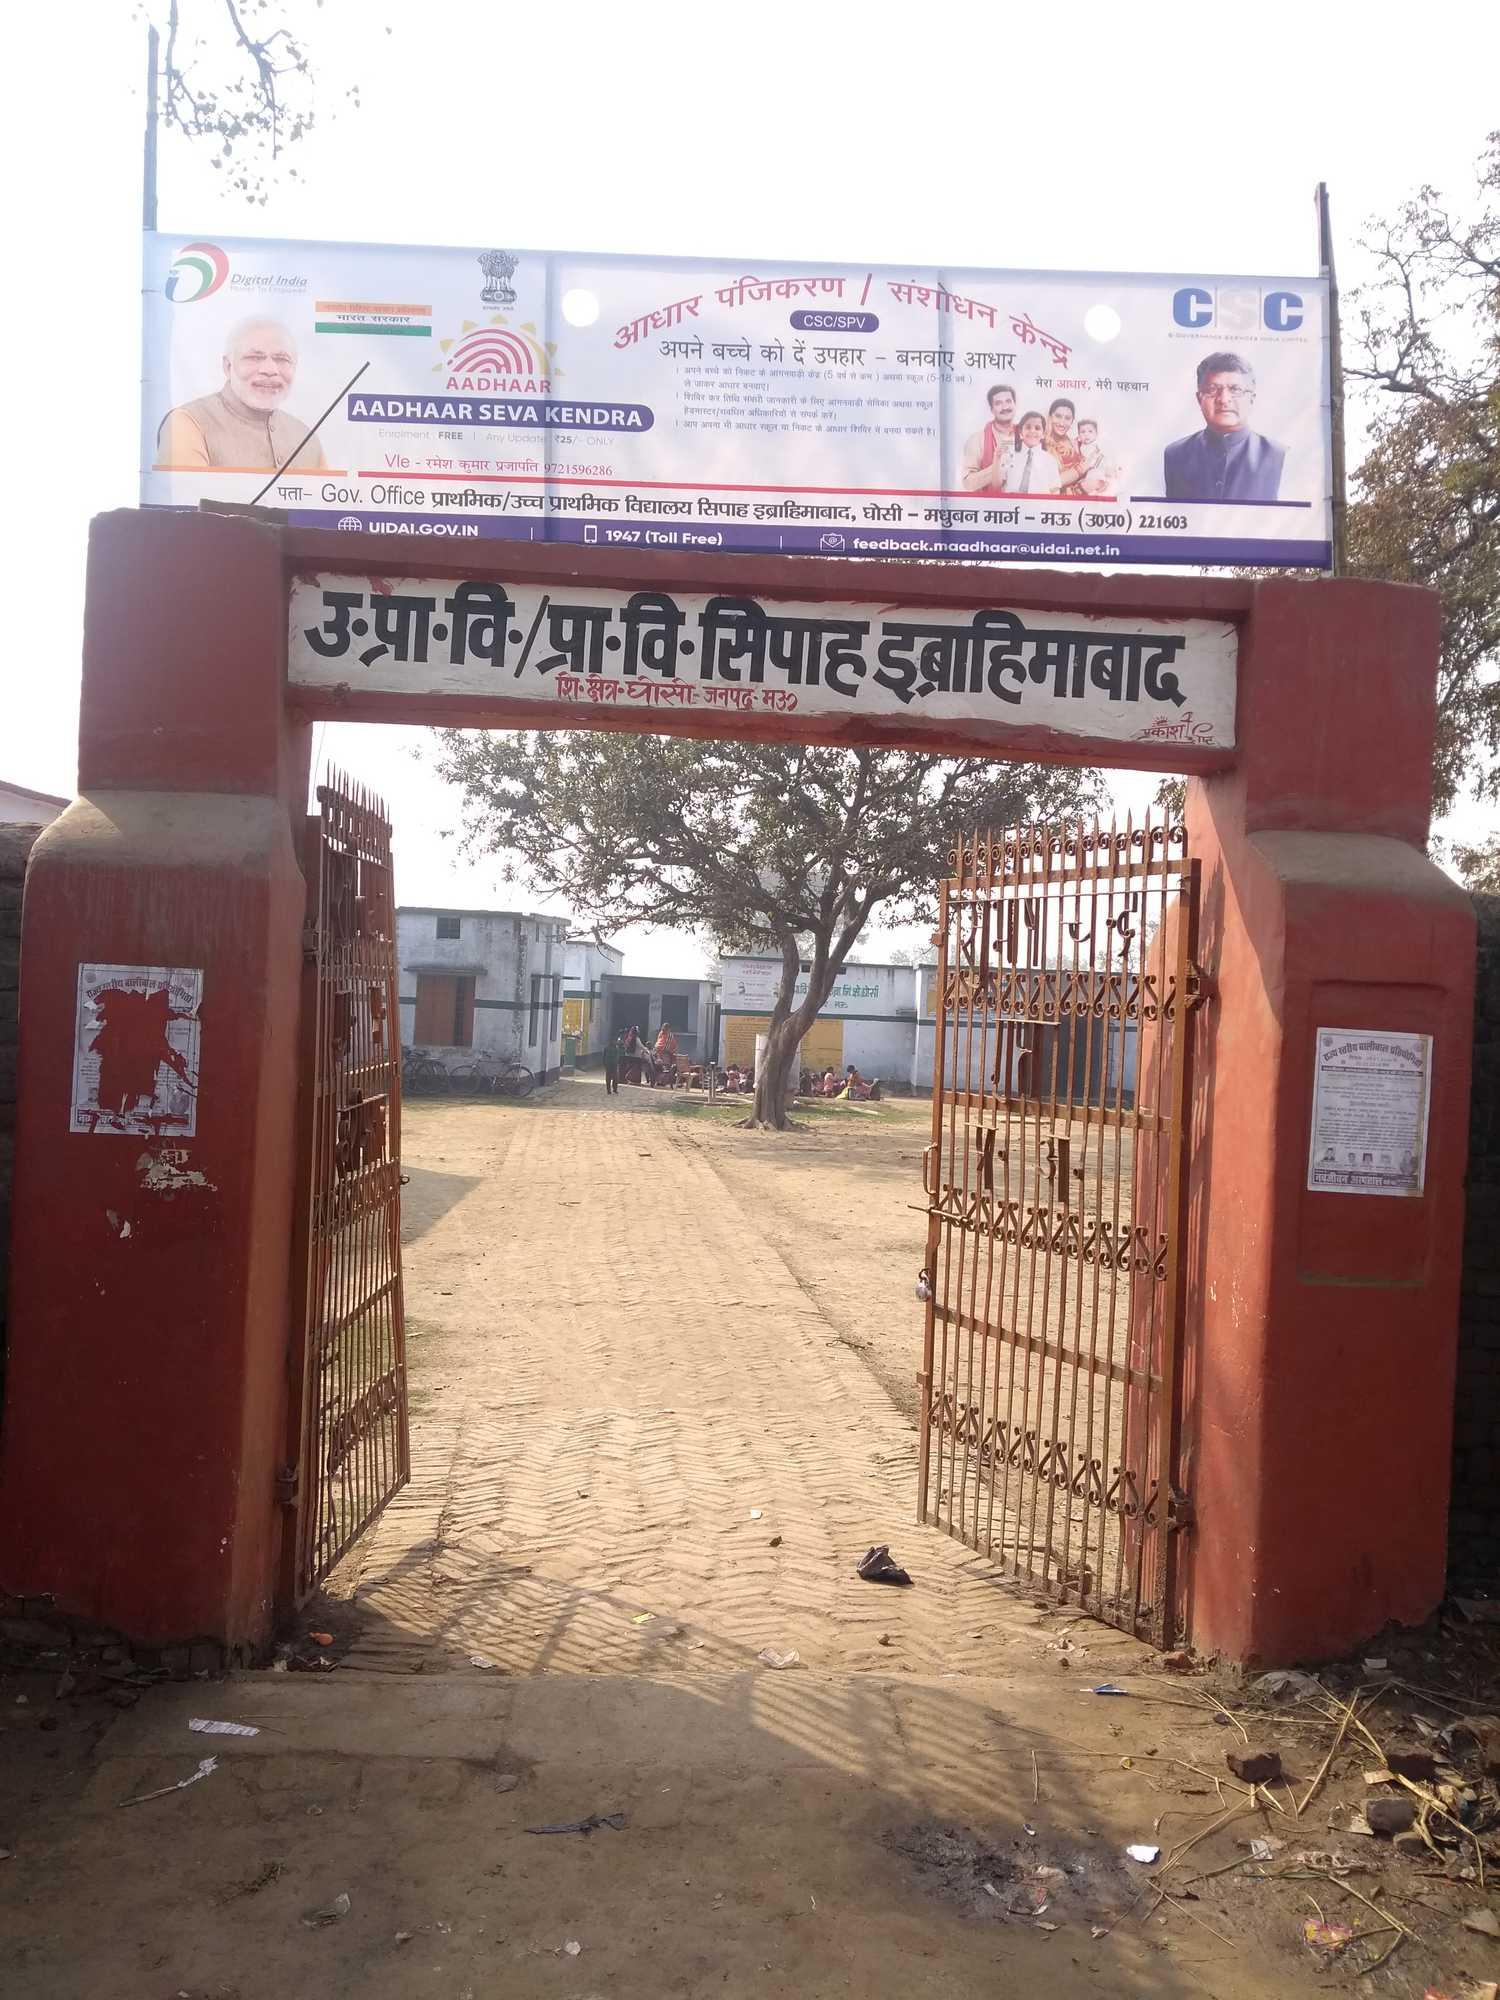 Top 50 Aadhar Card Agents in Lucknow - Best Aadhar Centers